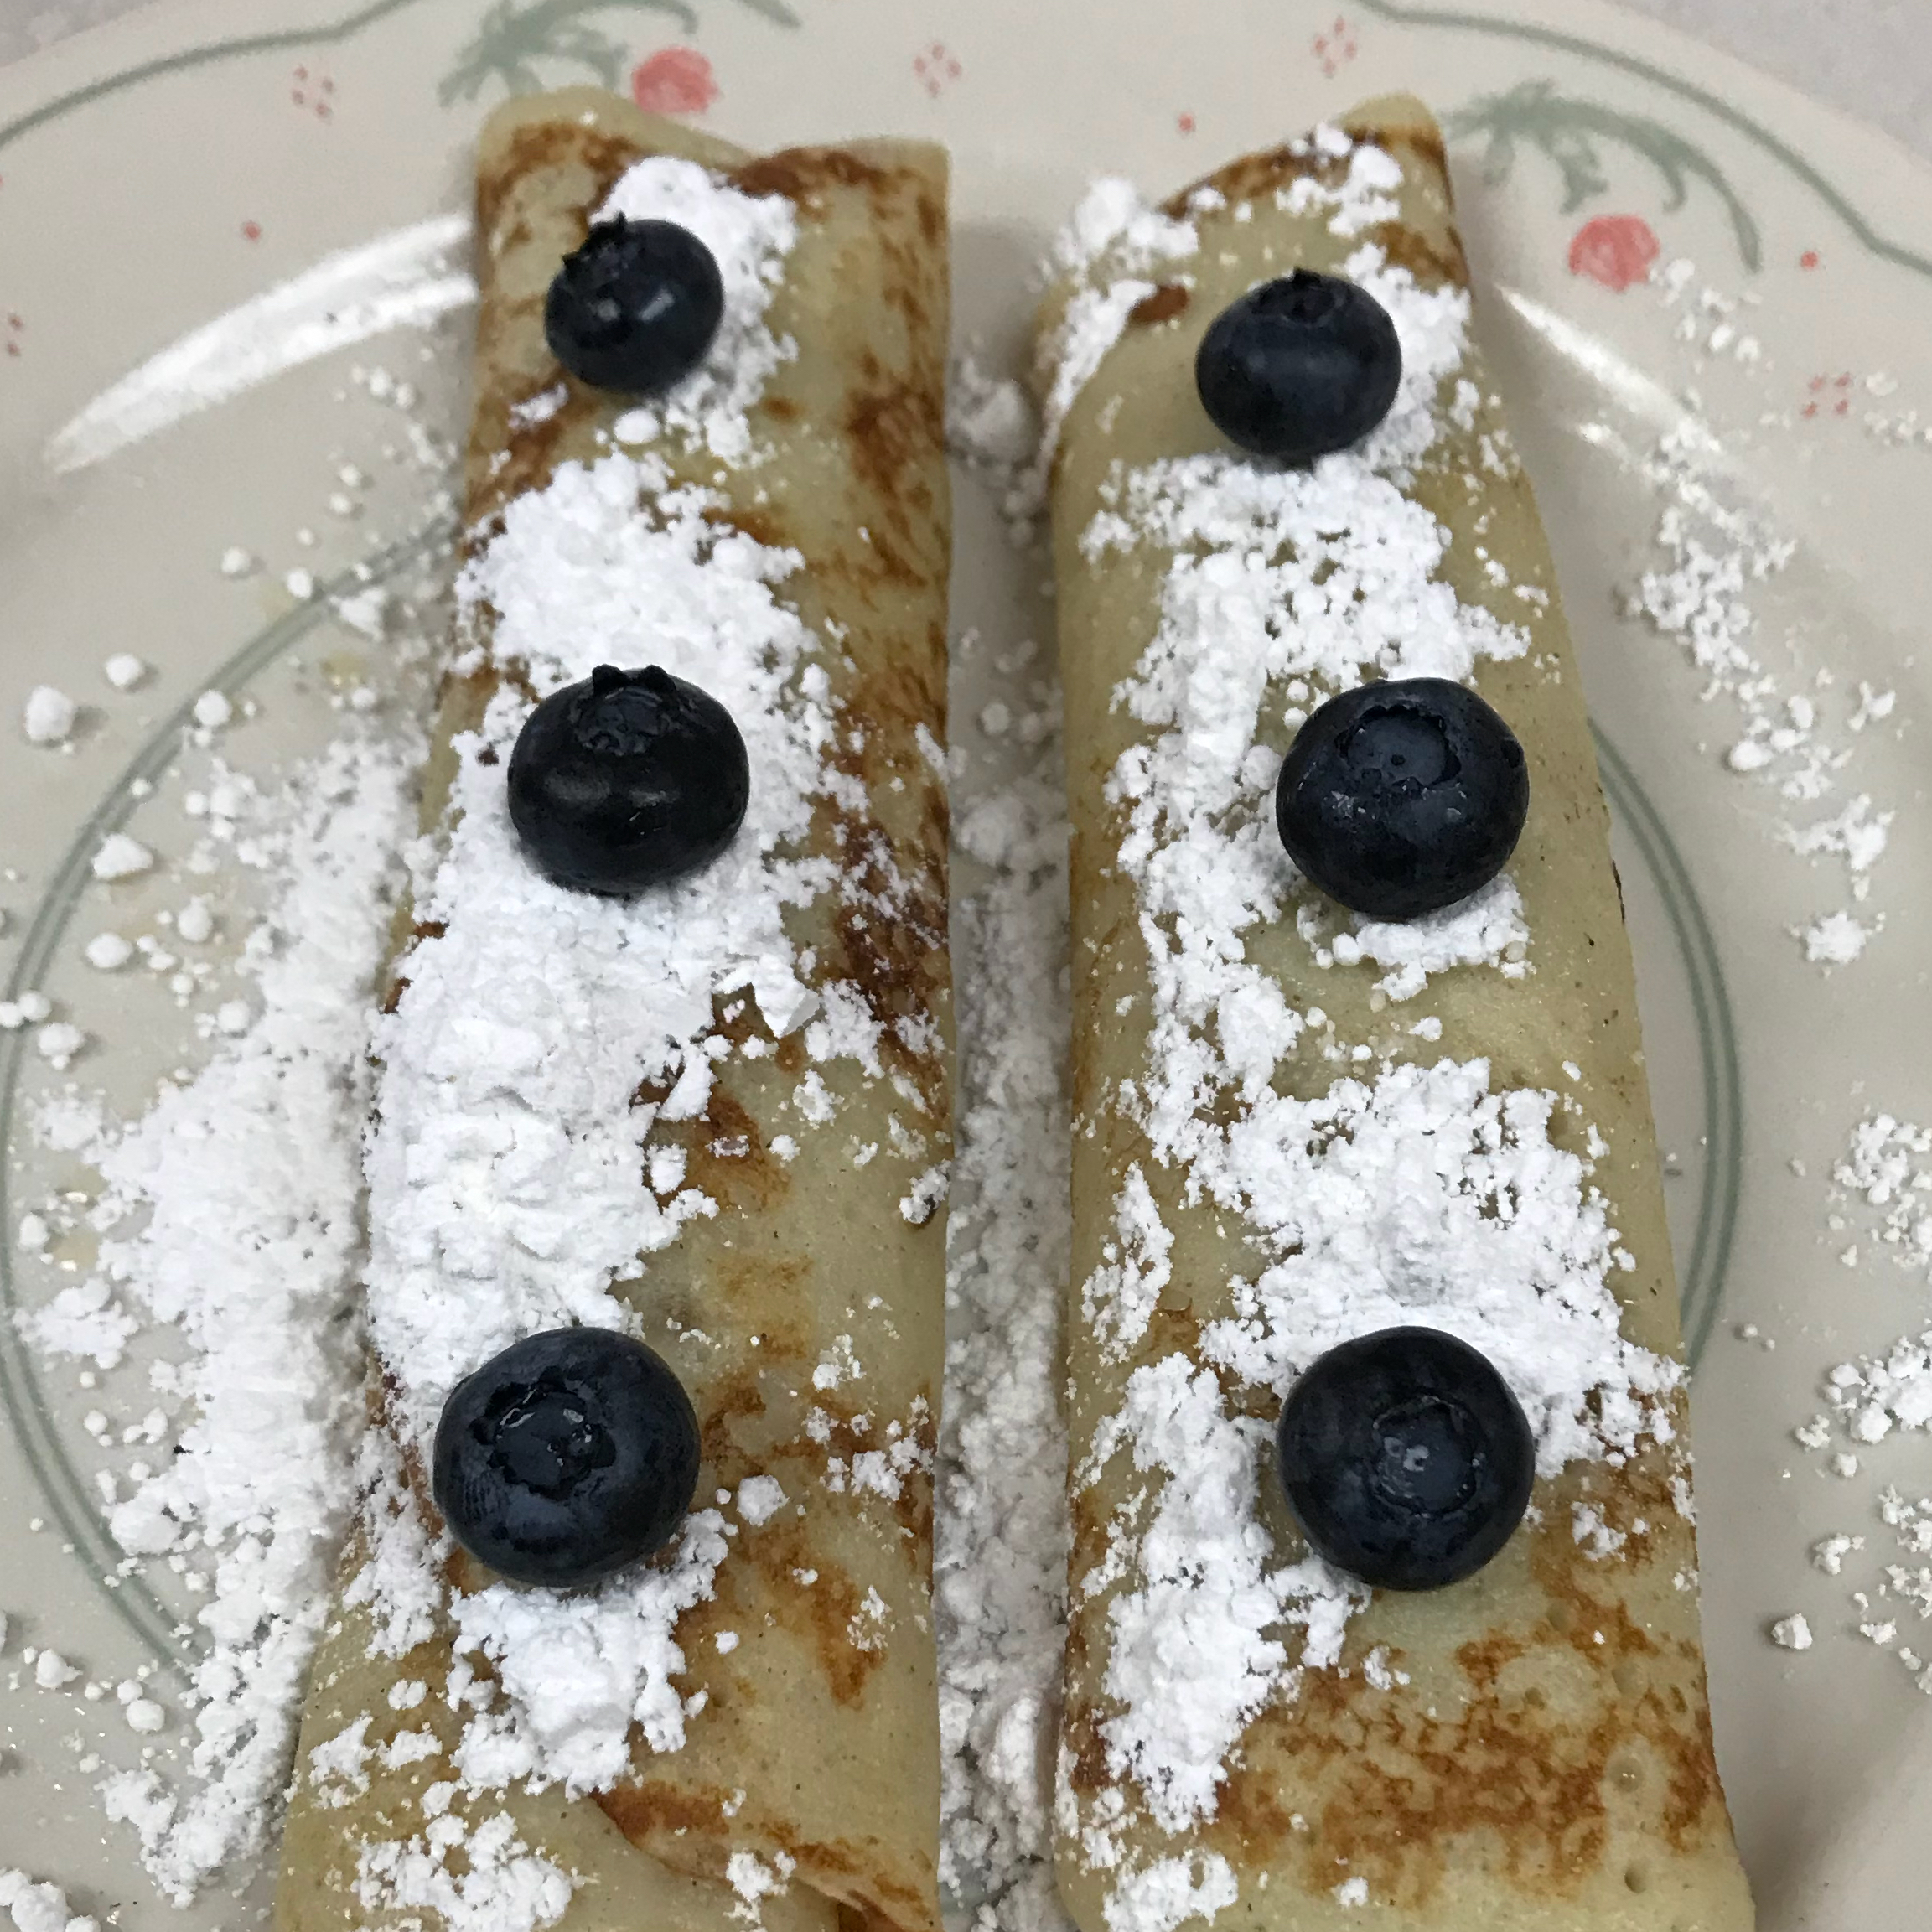 Arvidson Swedish Pancakes Greta Krueger Dominguez